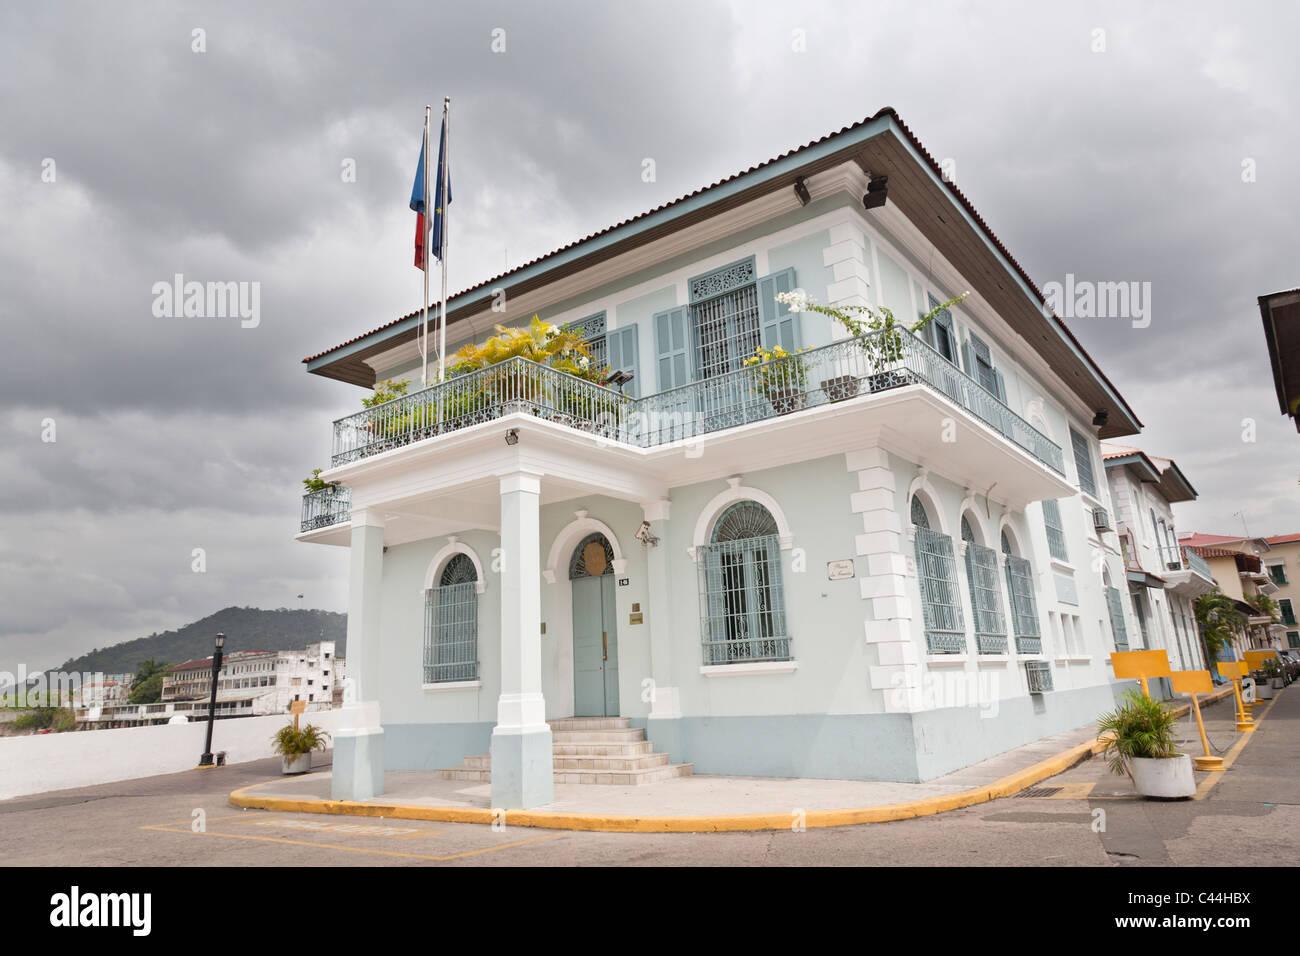 Ambasciata francese, Casco Viejo, Panama City. Immagini Stock